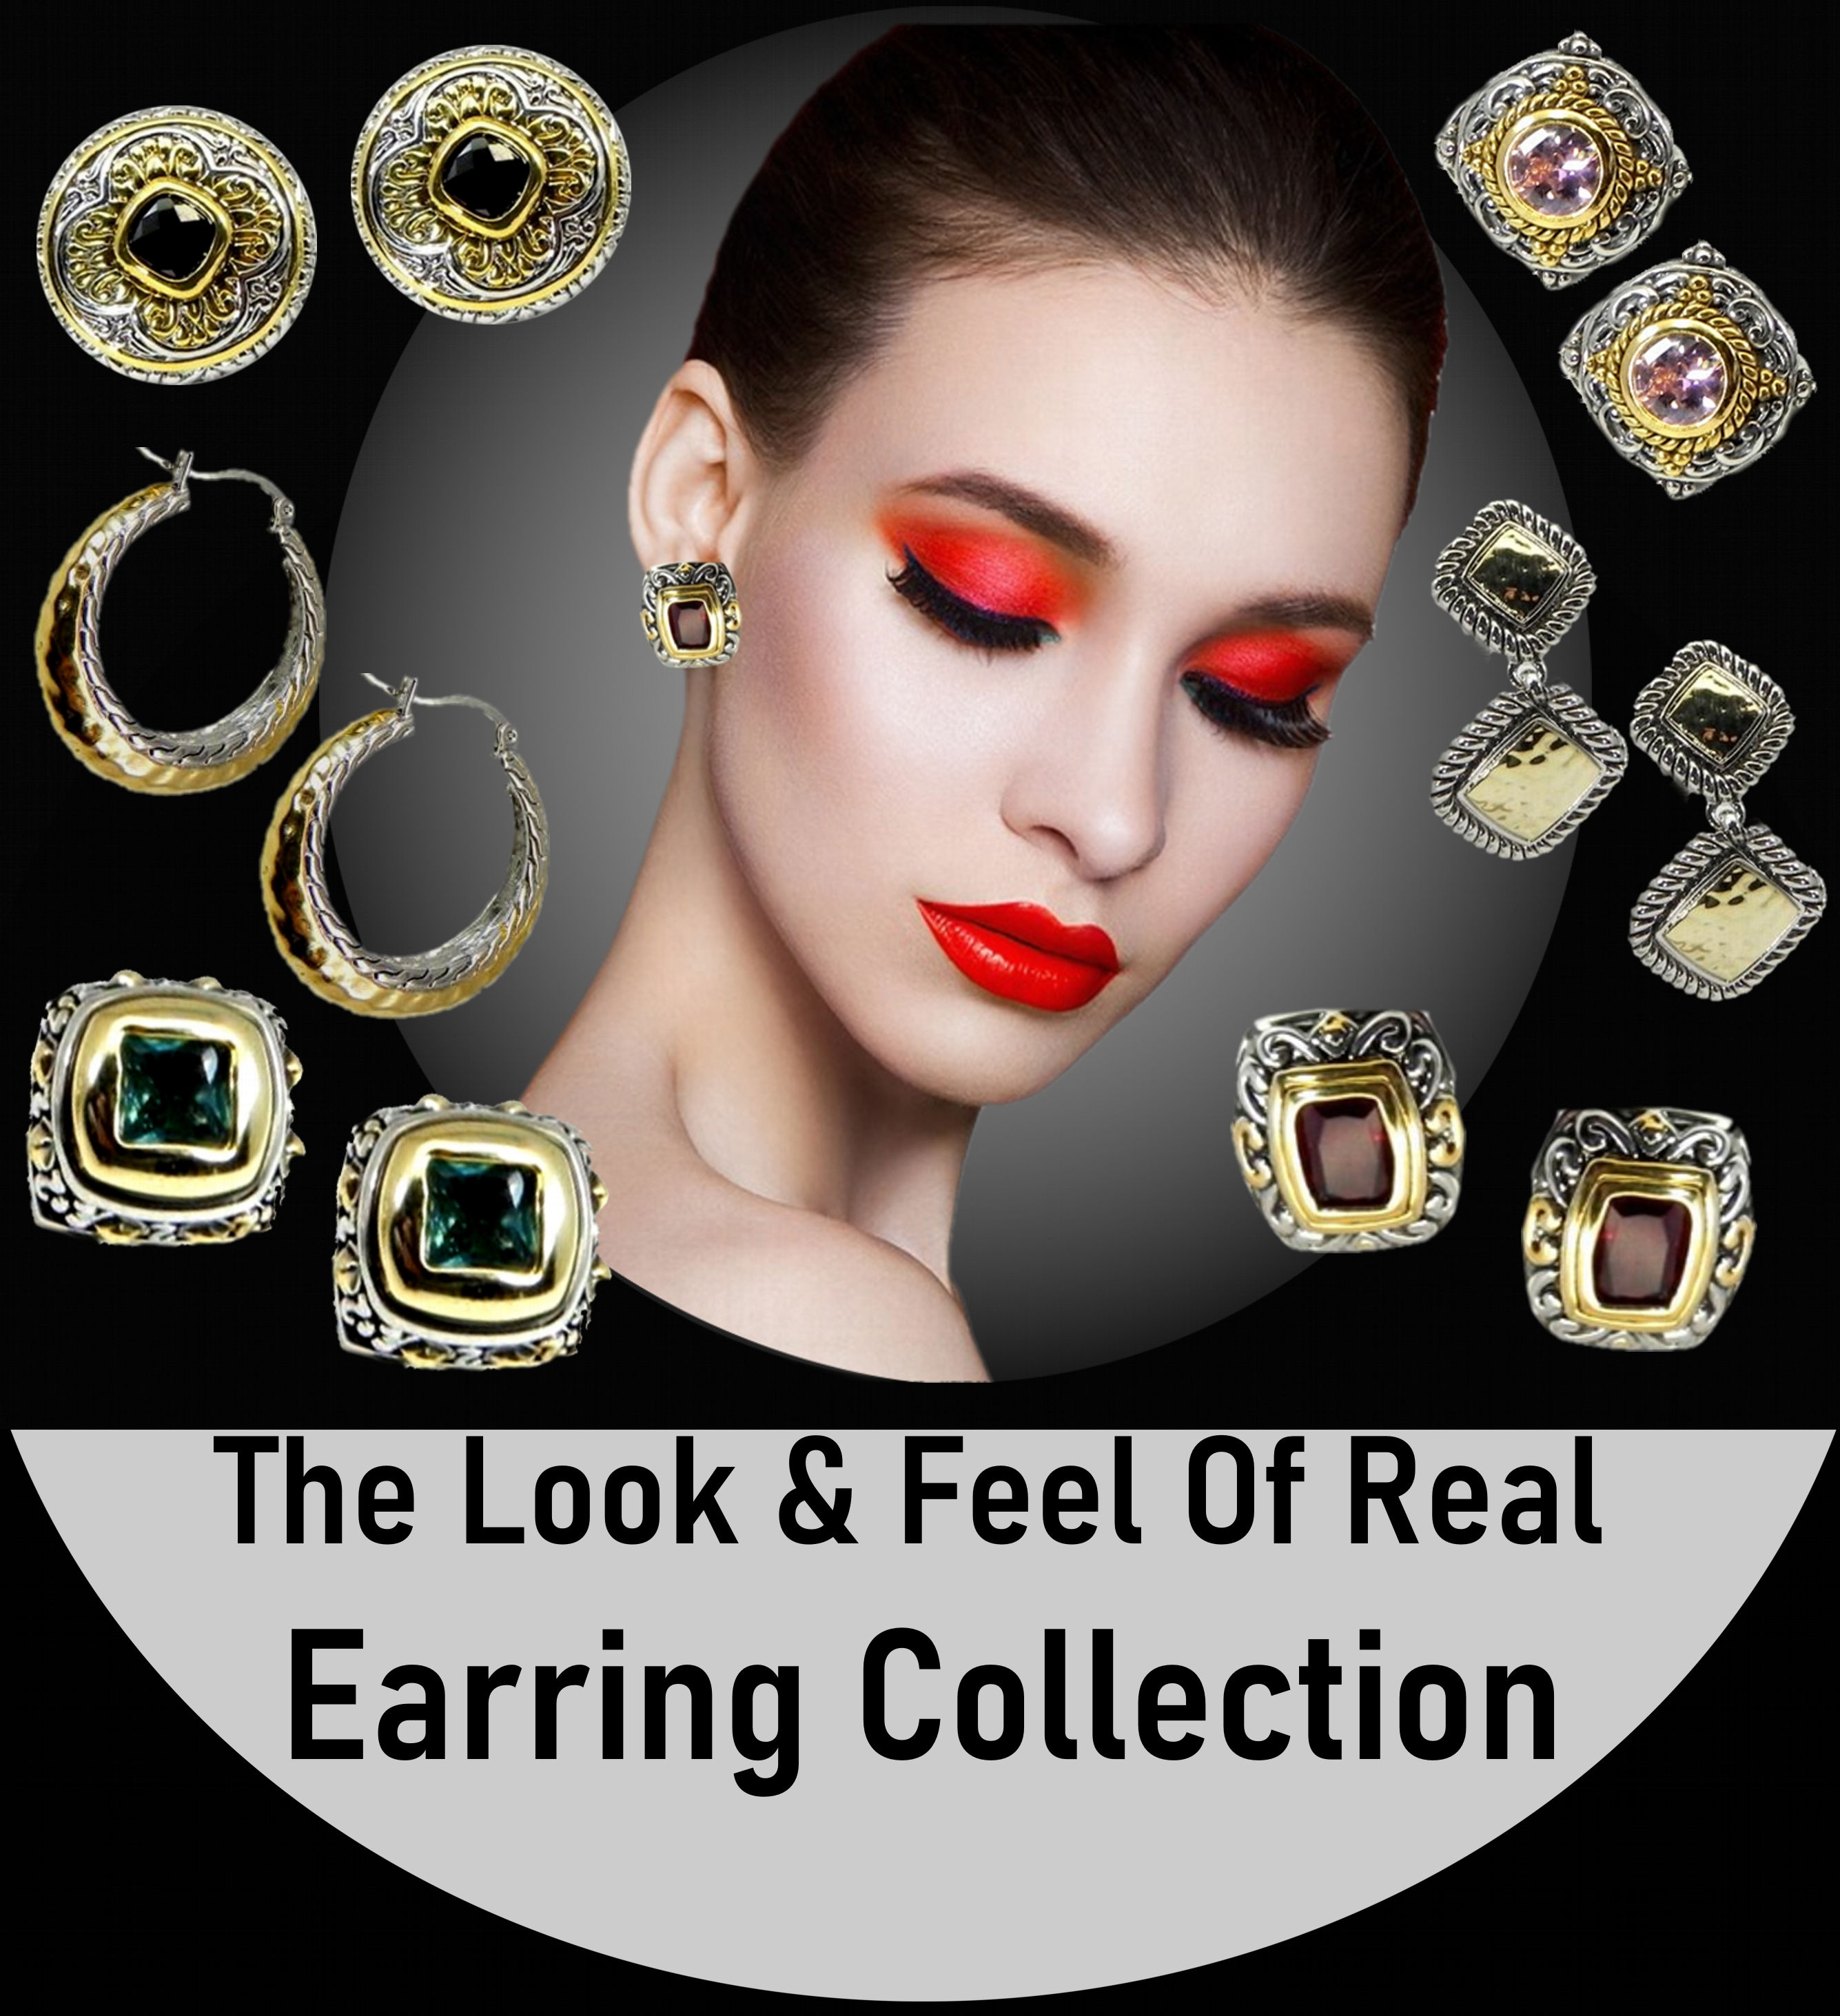 https://www.realimpostersjewelry.com/the-look-the-feel-of-real-earrings